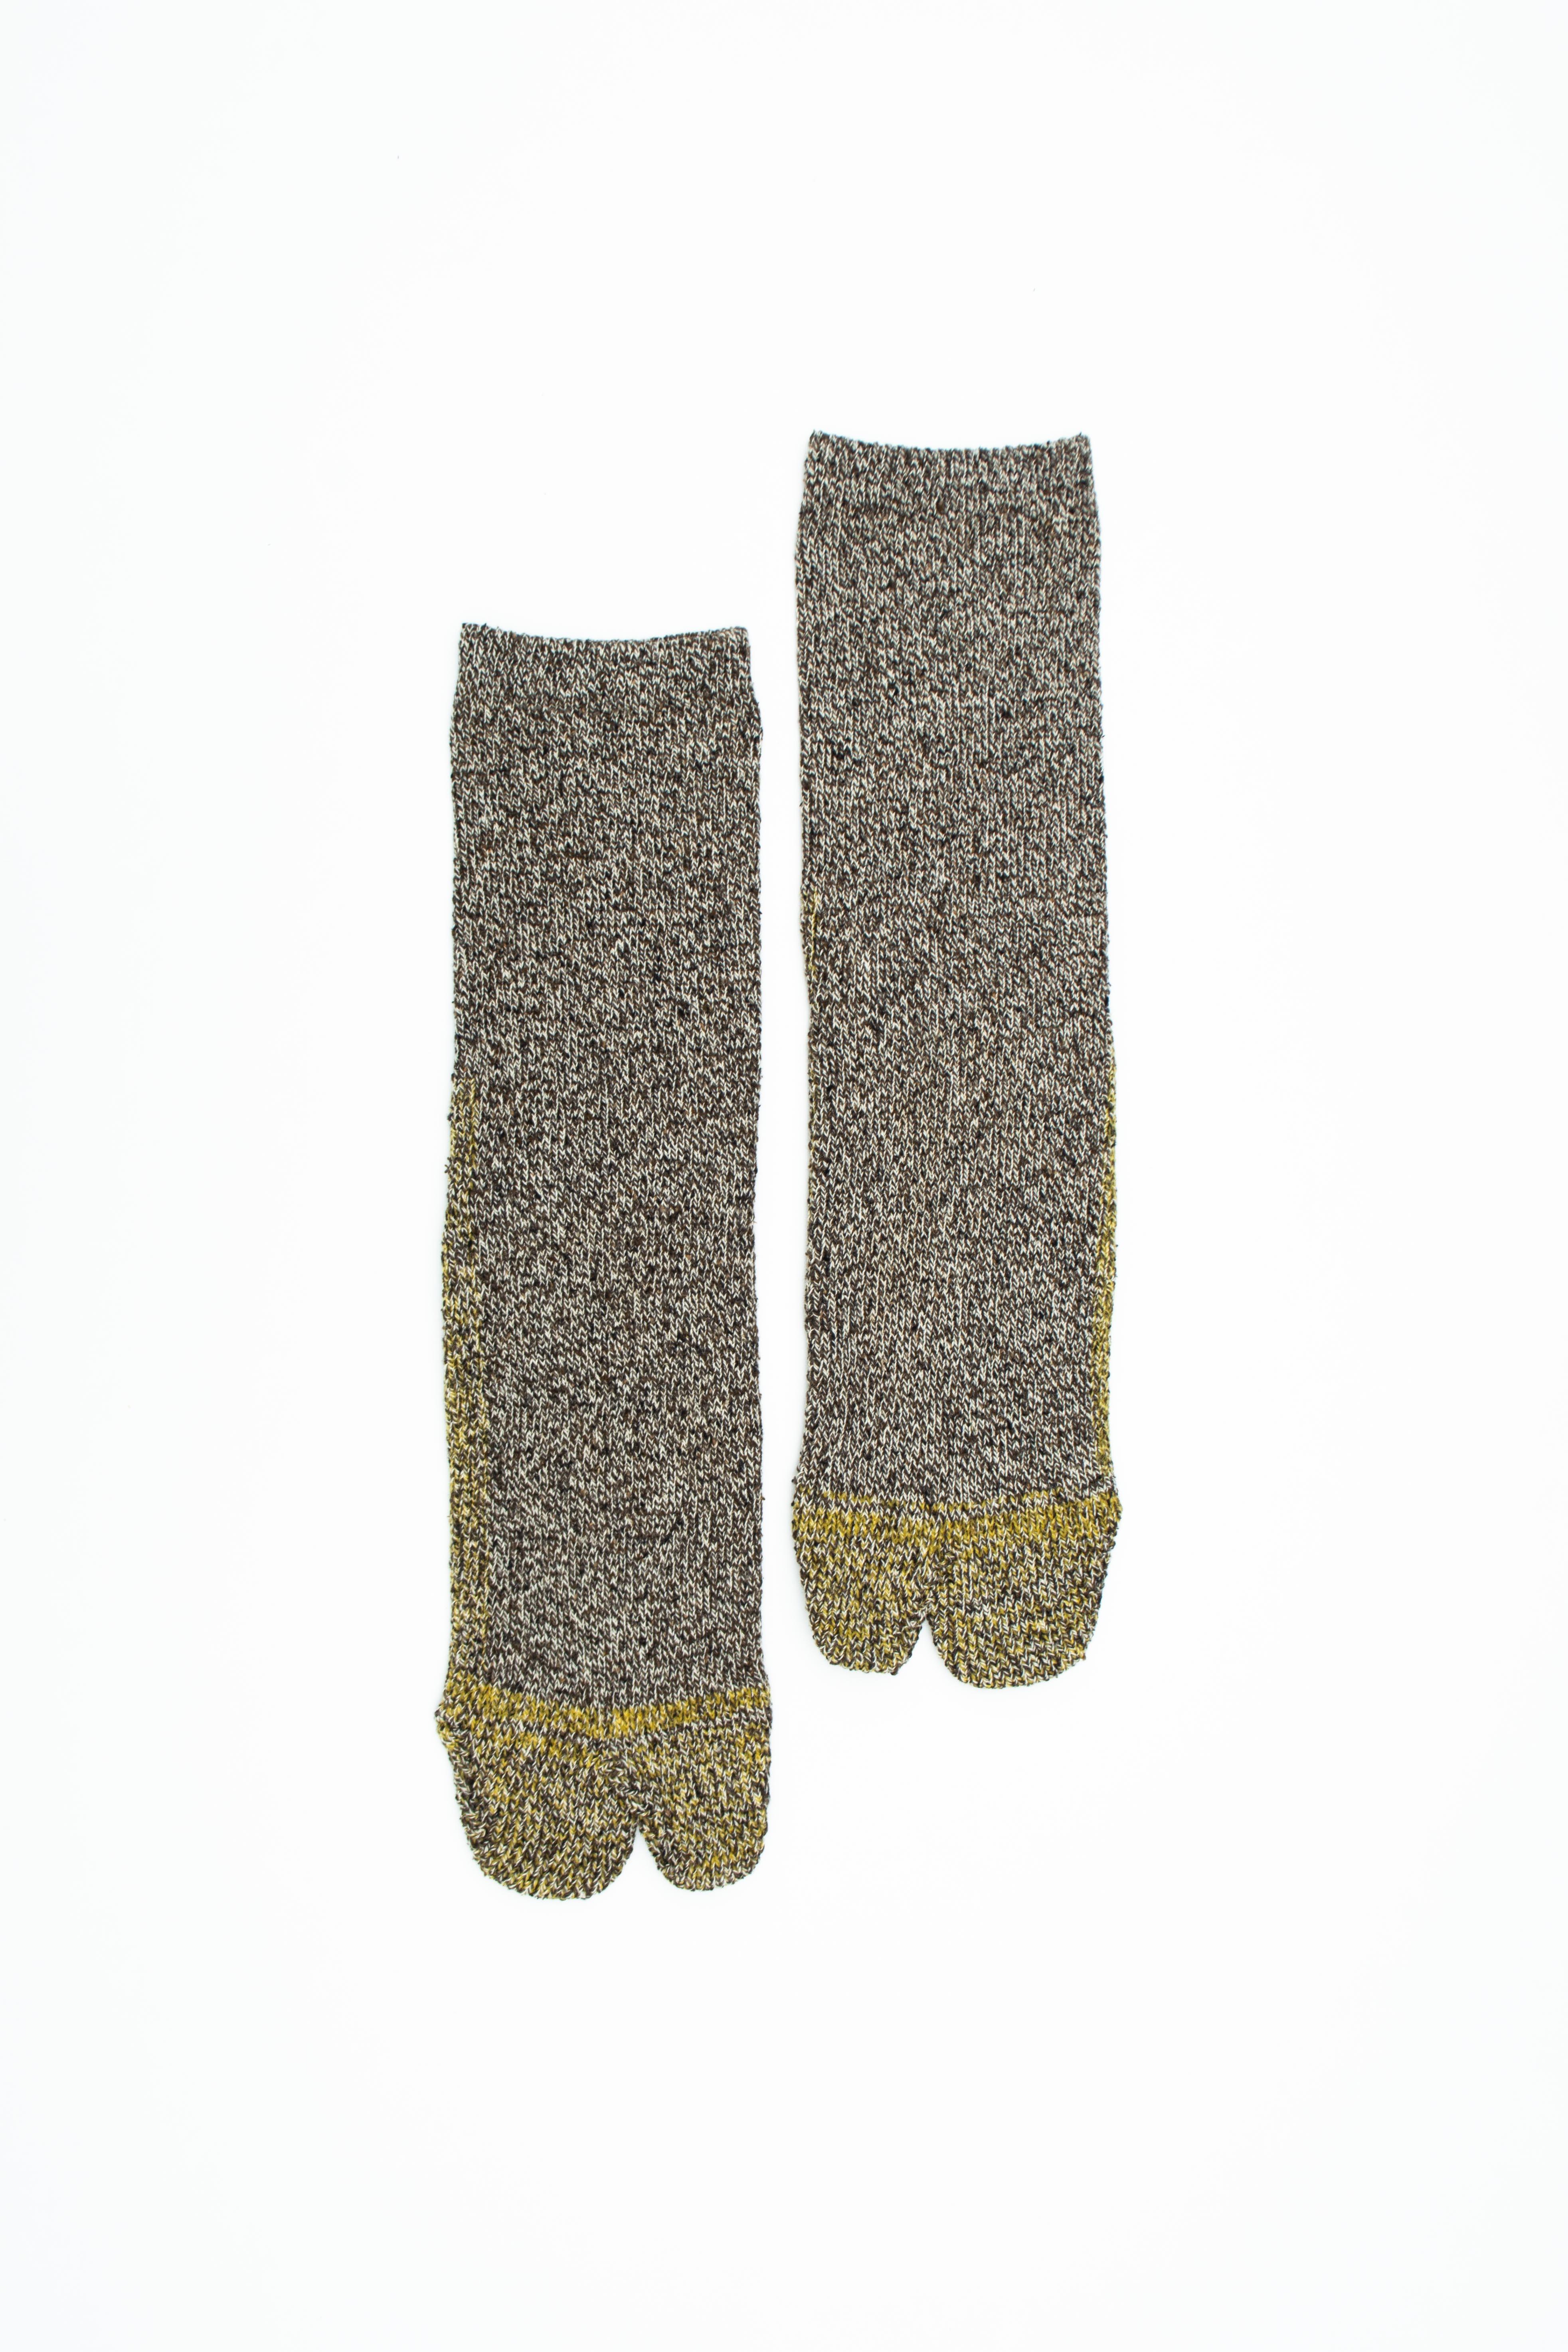 Cotton Silk Socks(Yellow)